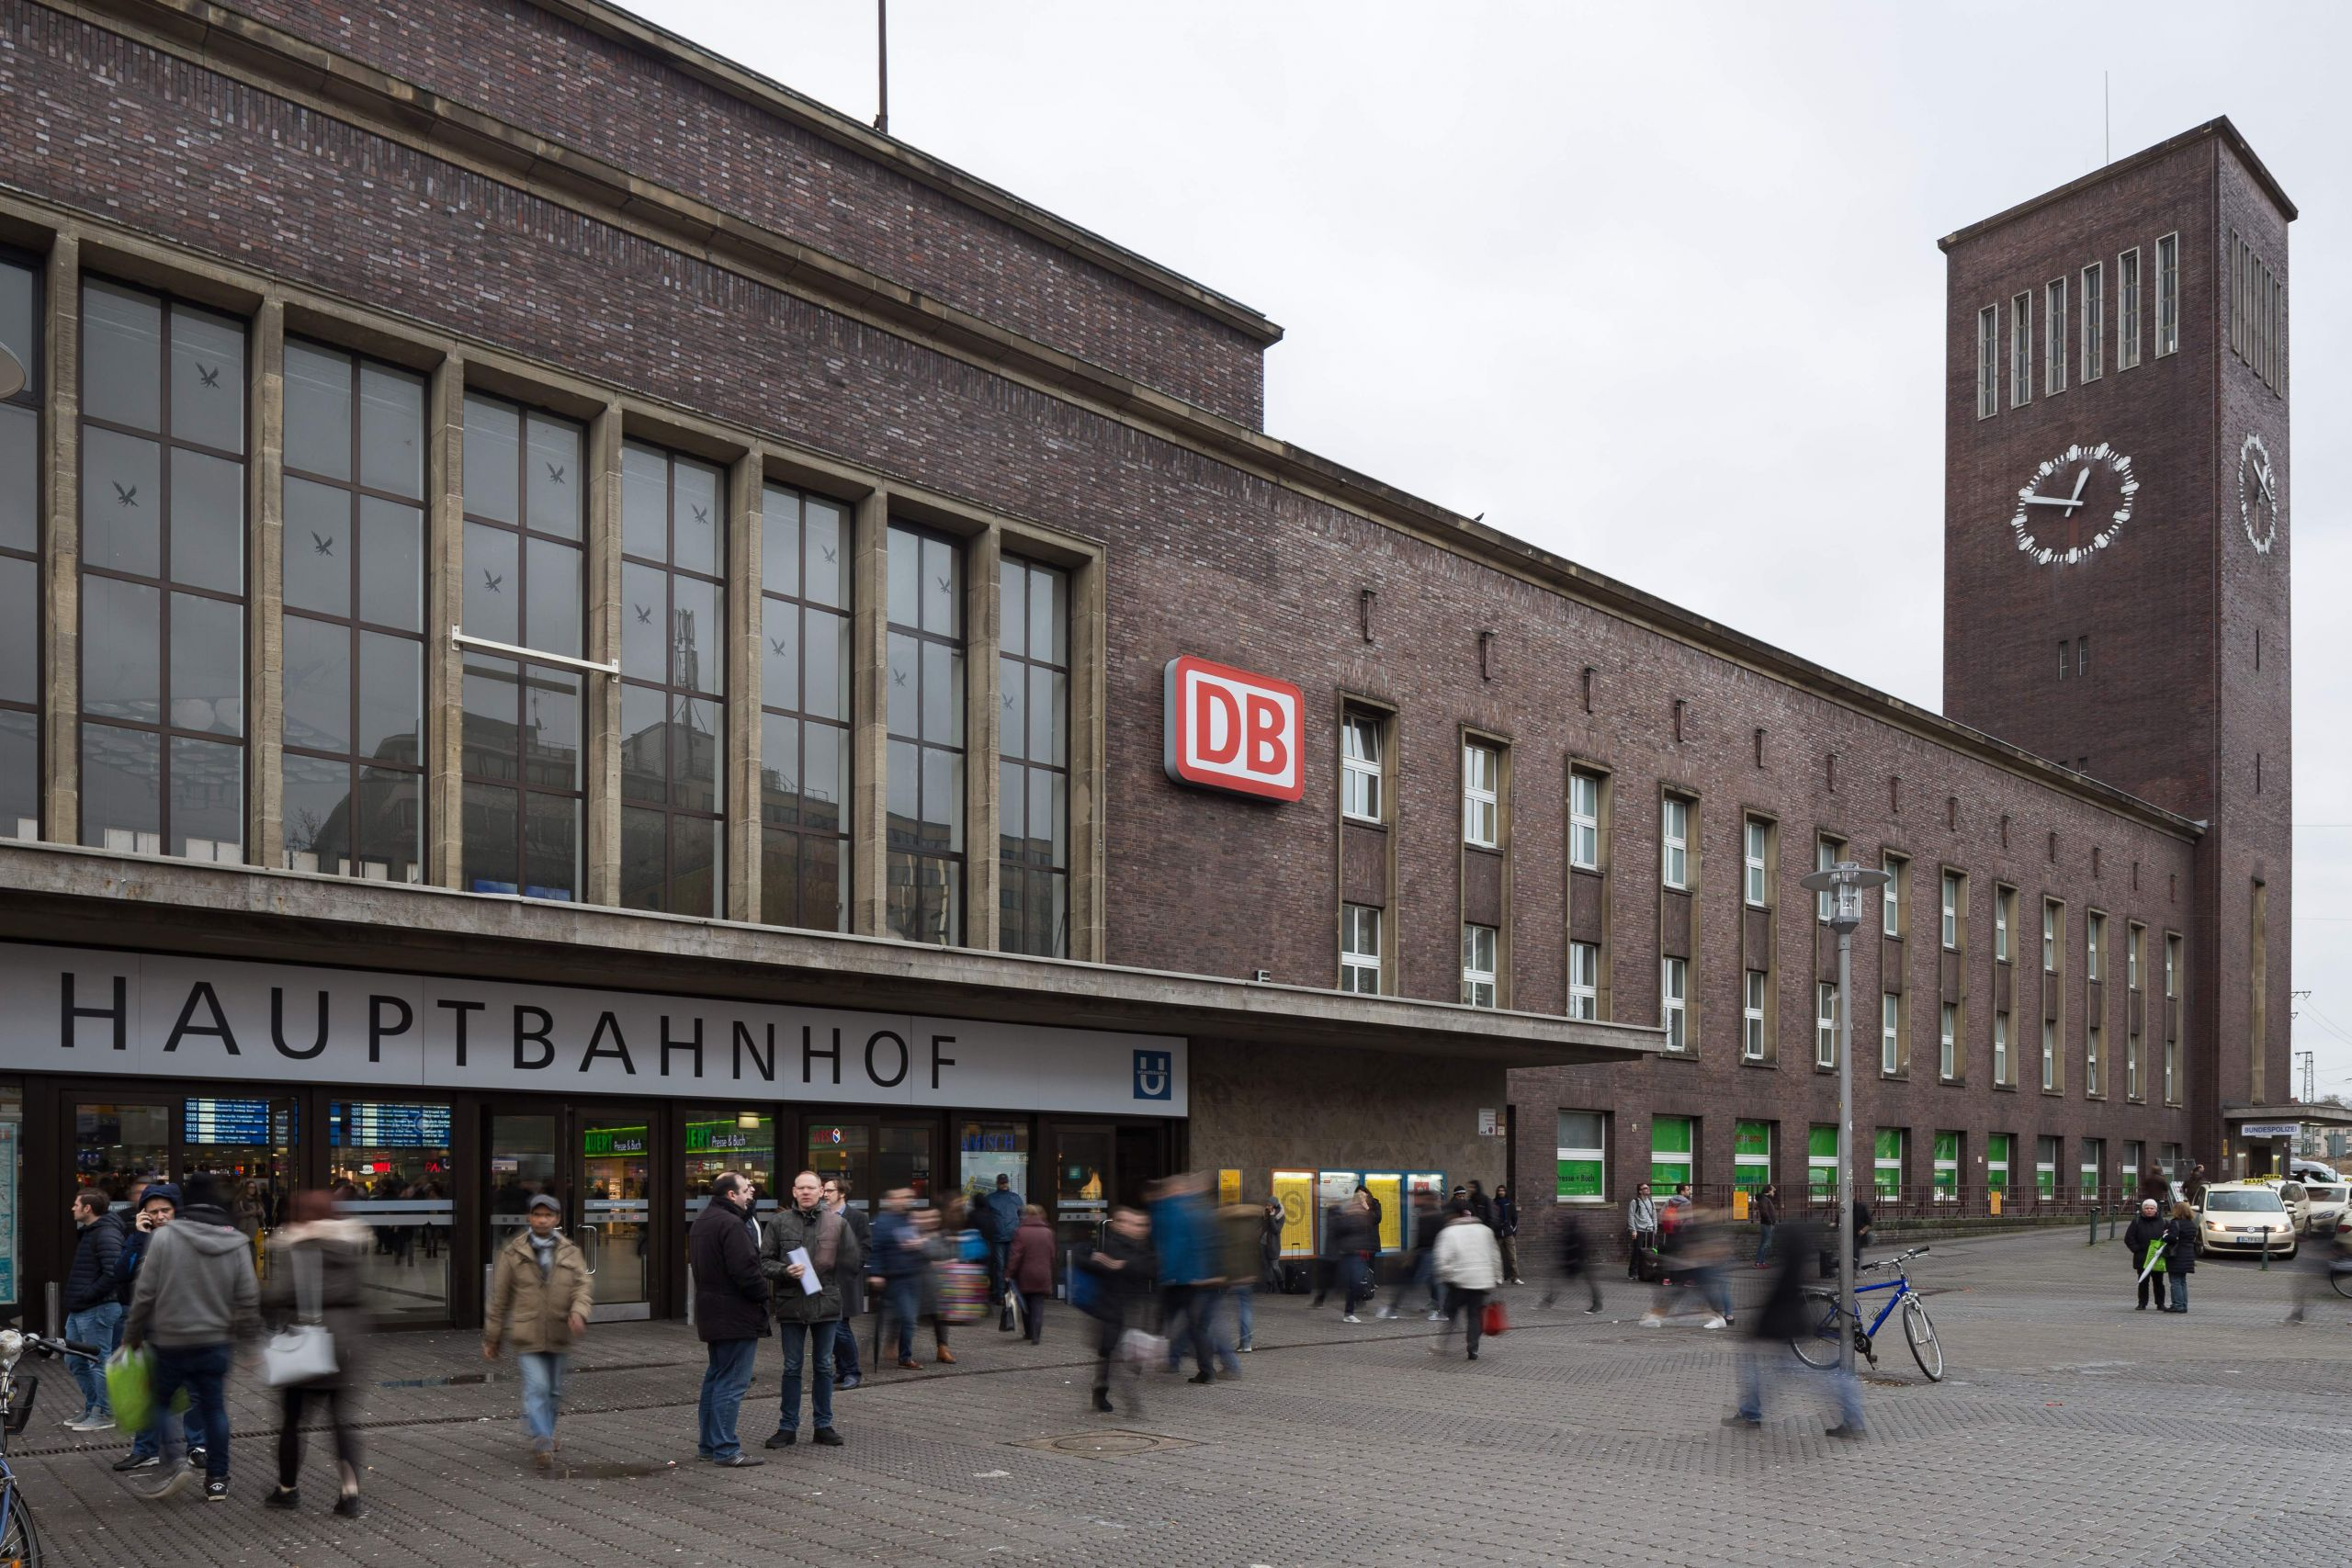 Duesseldorf main station Konrad Adenauer Platz Stadtmitte Duesseldorf Germany